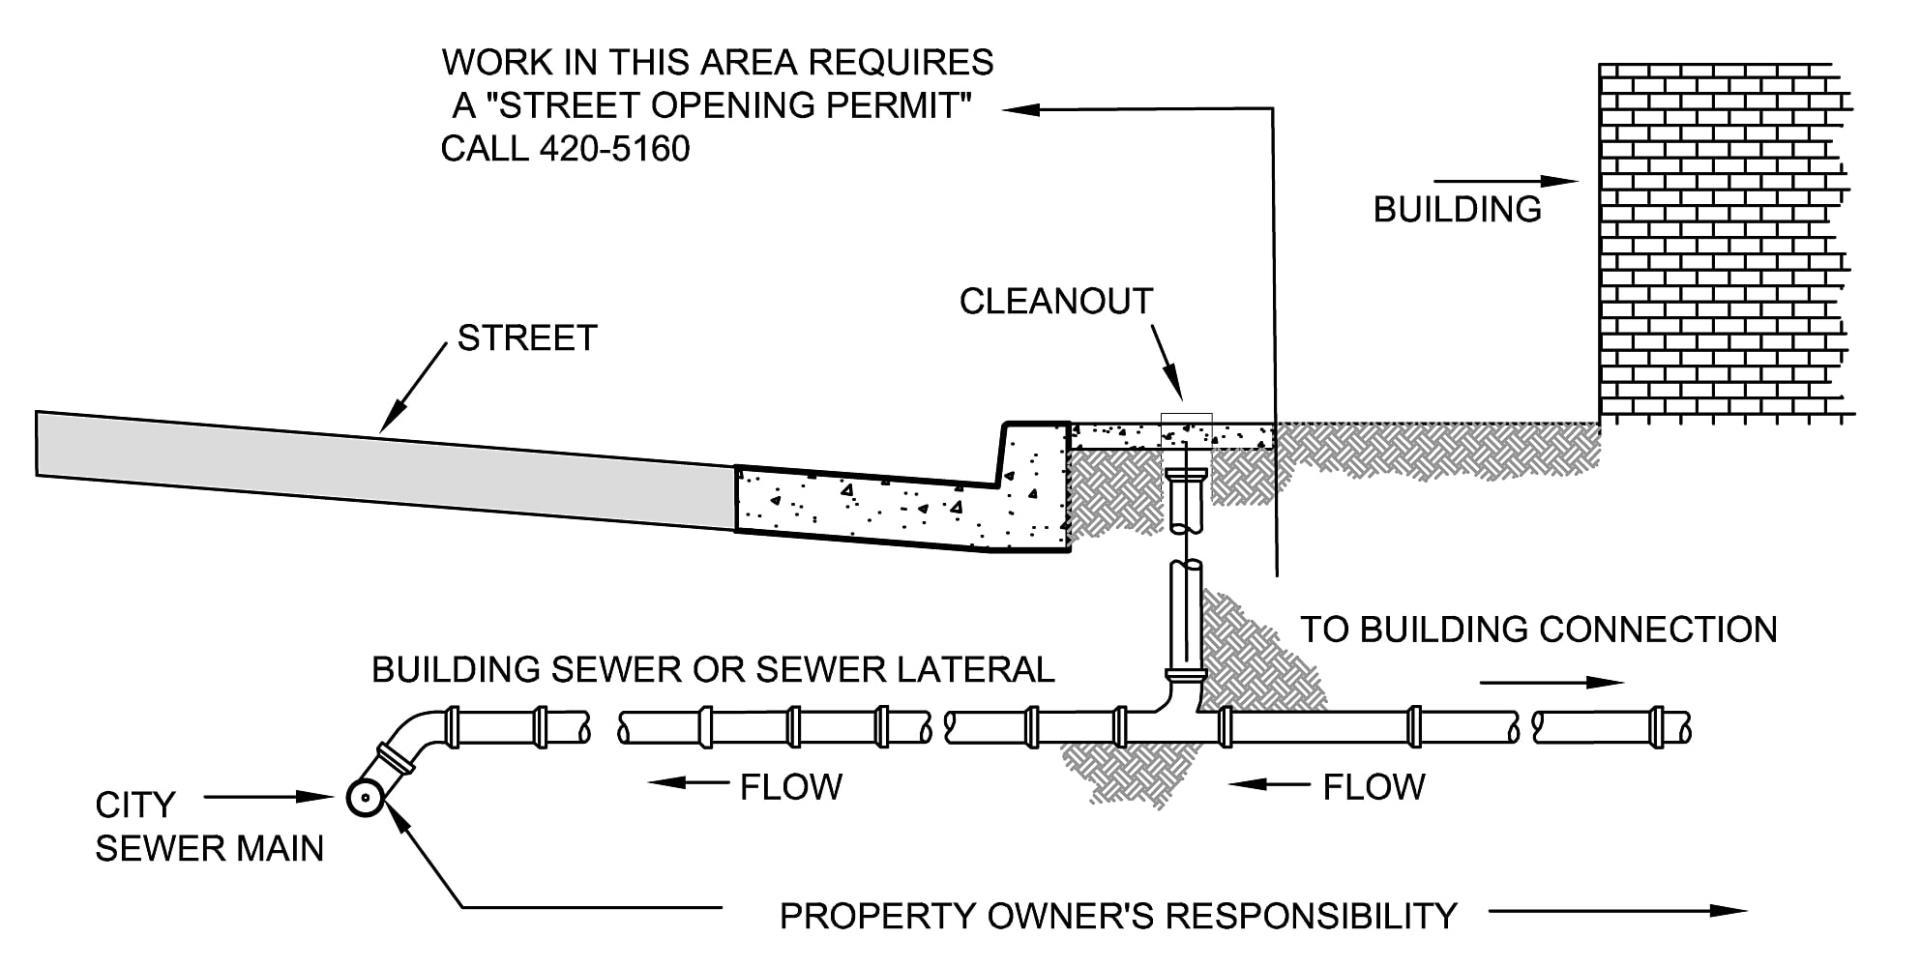 City Sanitary Sewer System | City of Santa Cruz